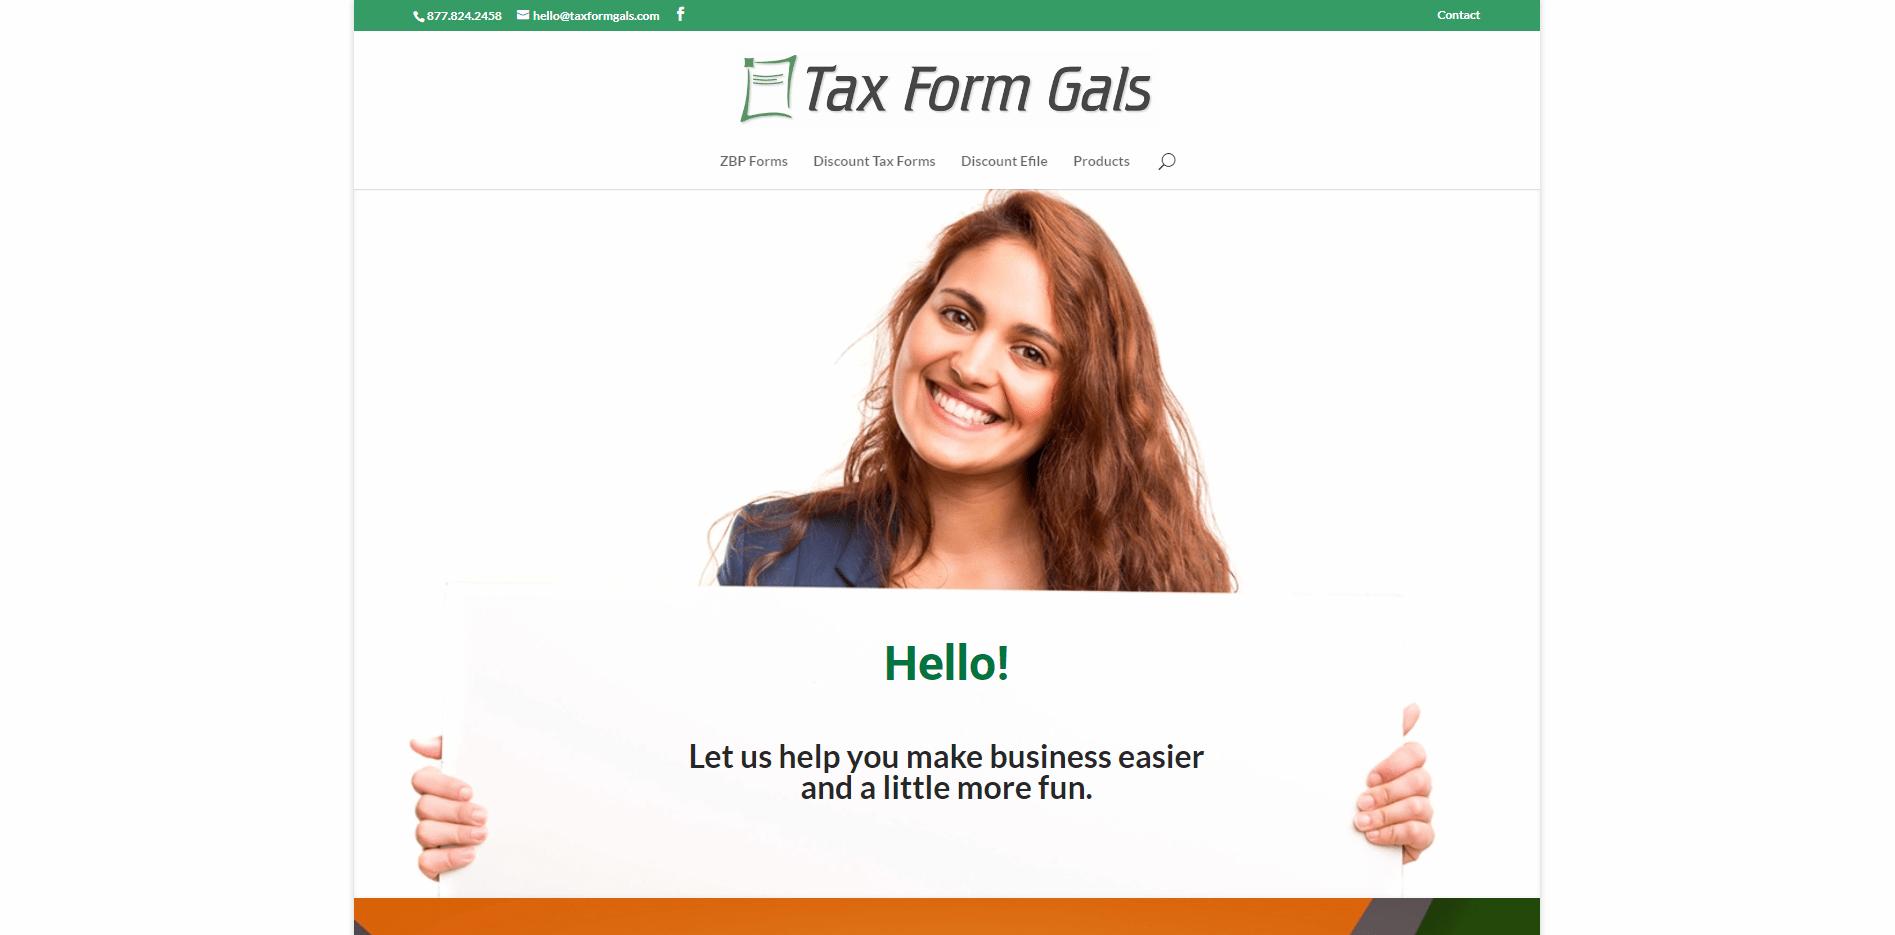 Tax Form Gals - Small Business Website by Purple Gen